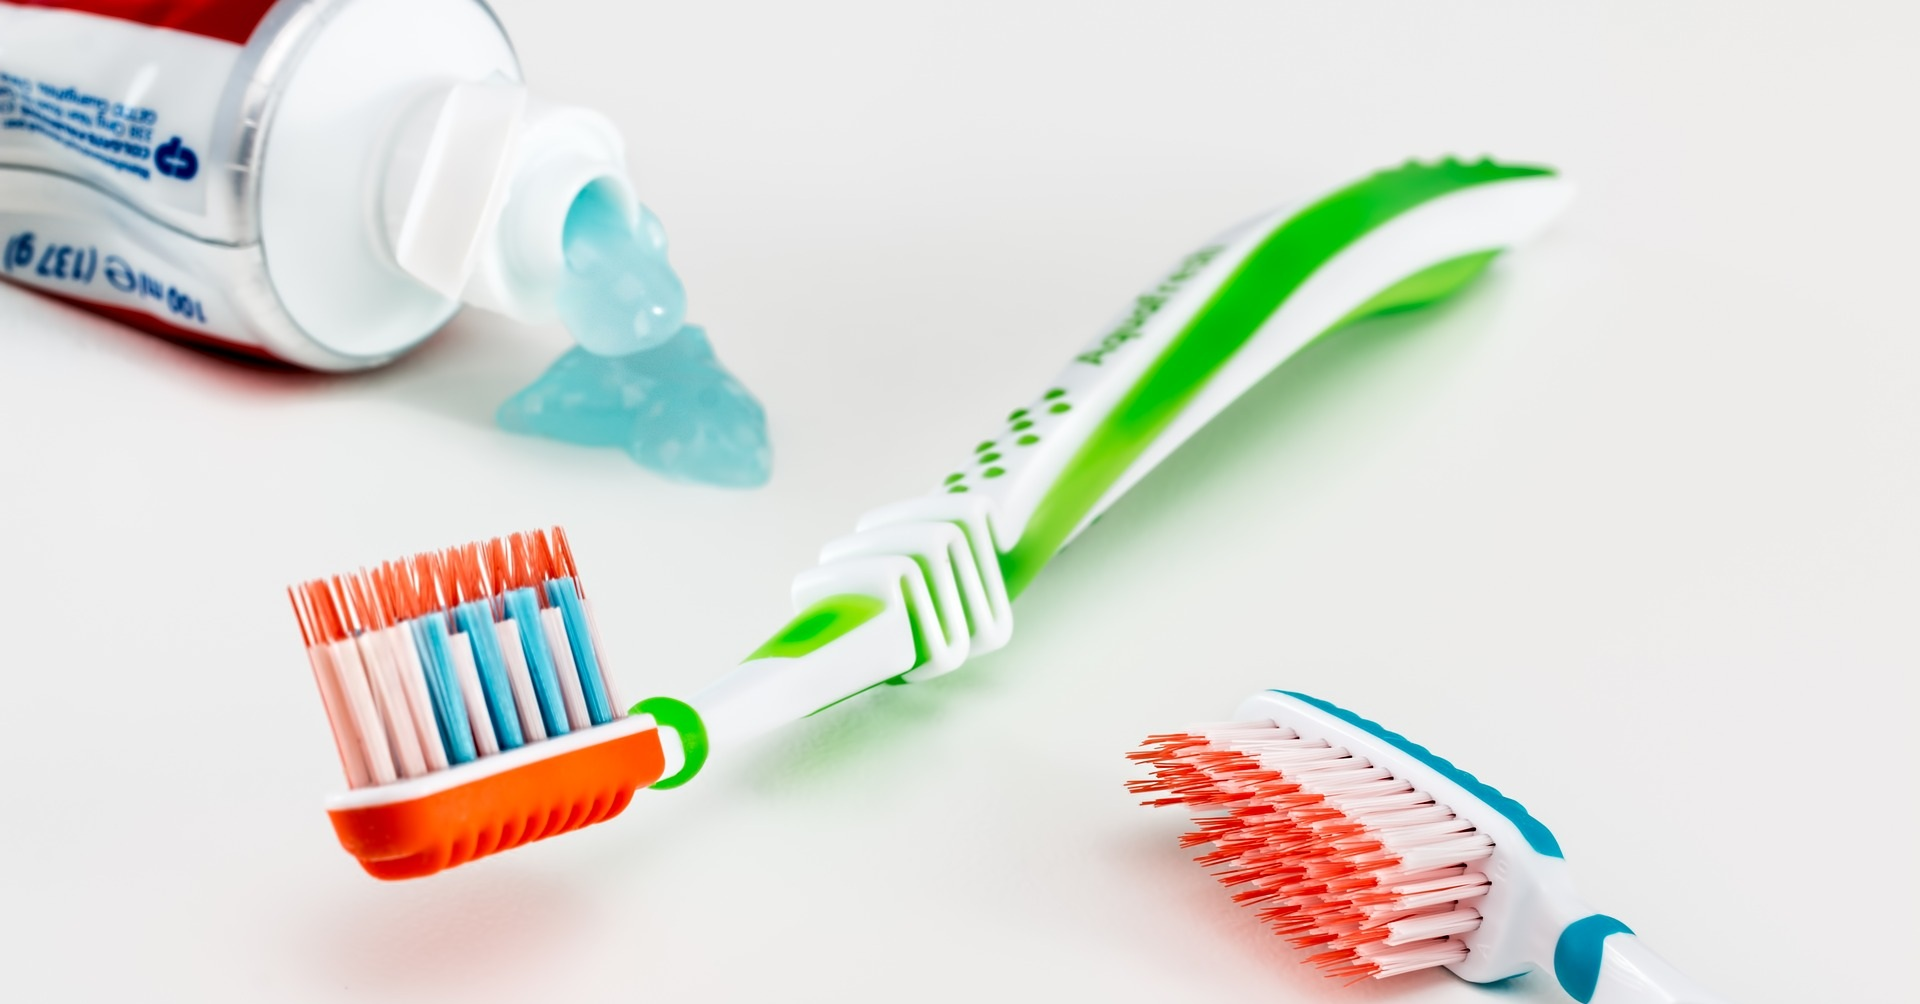 toothbrush-3191097_1920.jpg